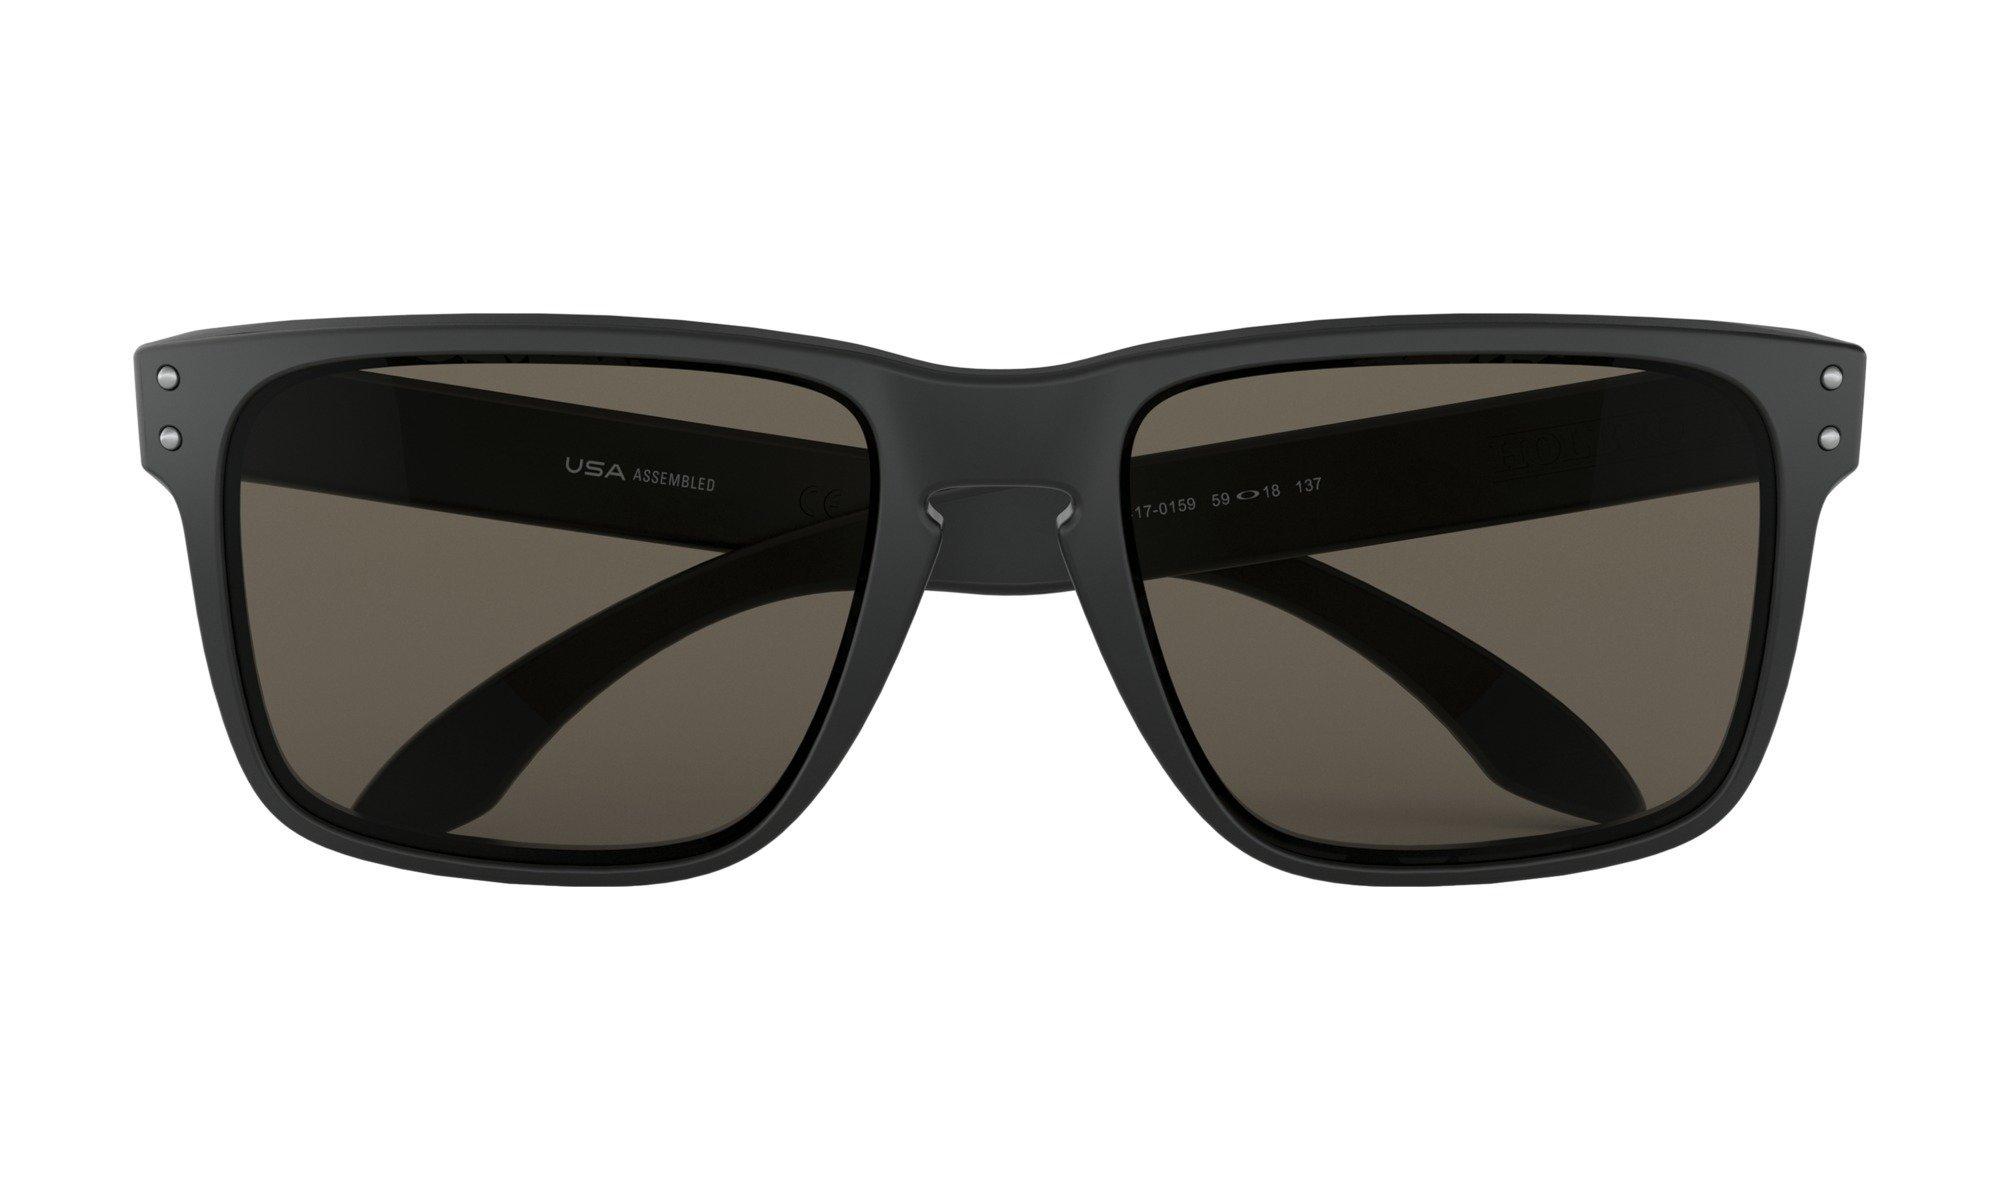 Oakley-Holbrook Matte Black with warm grey